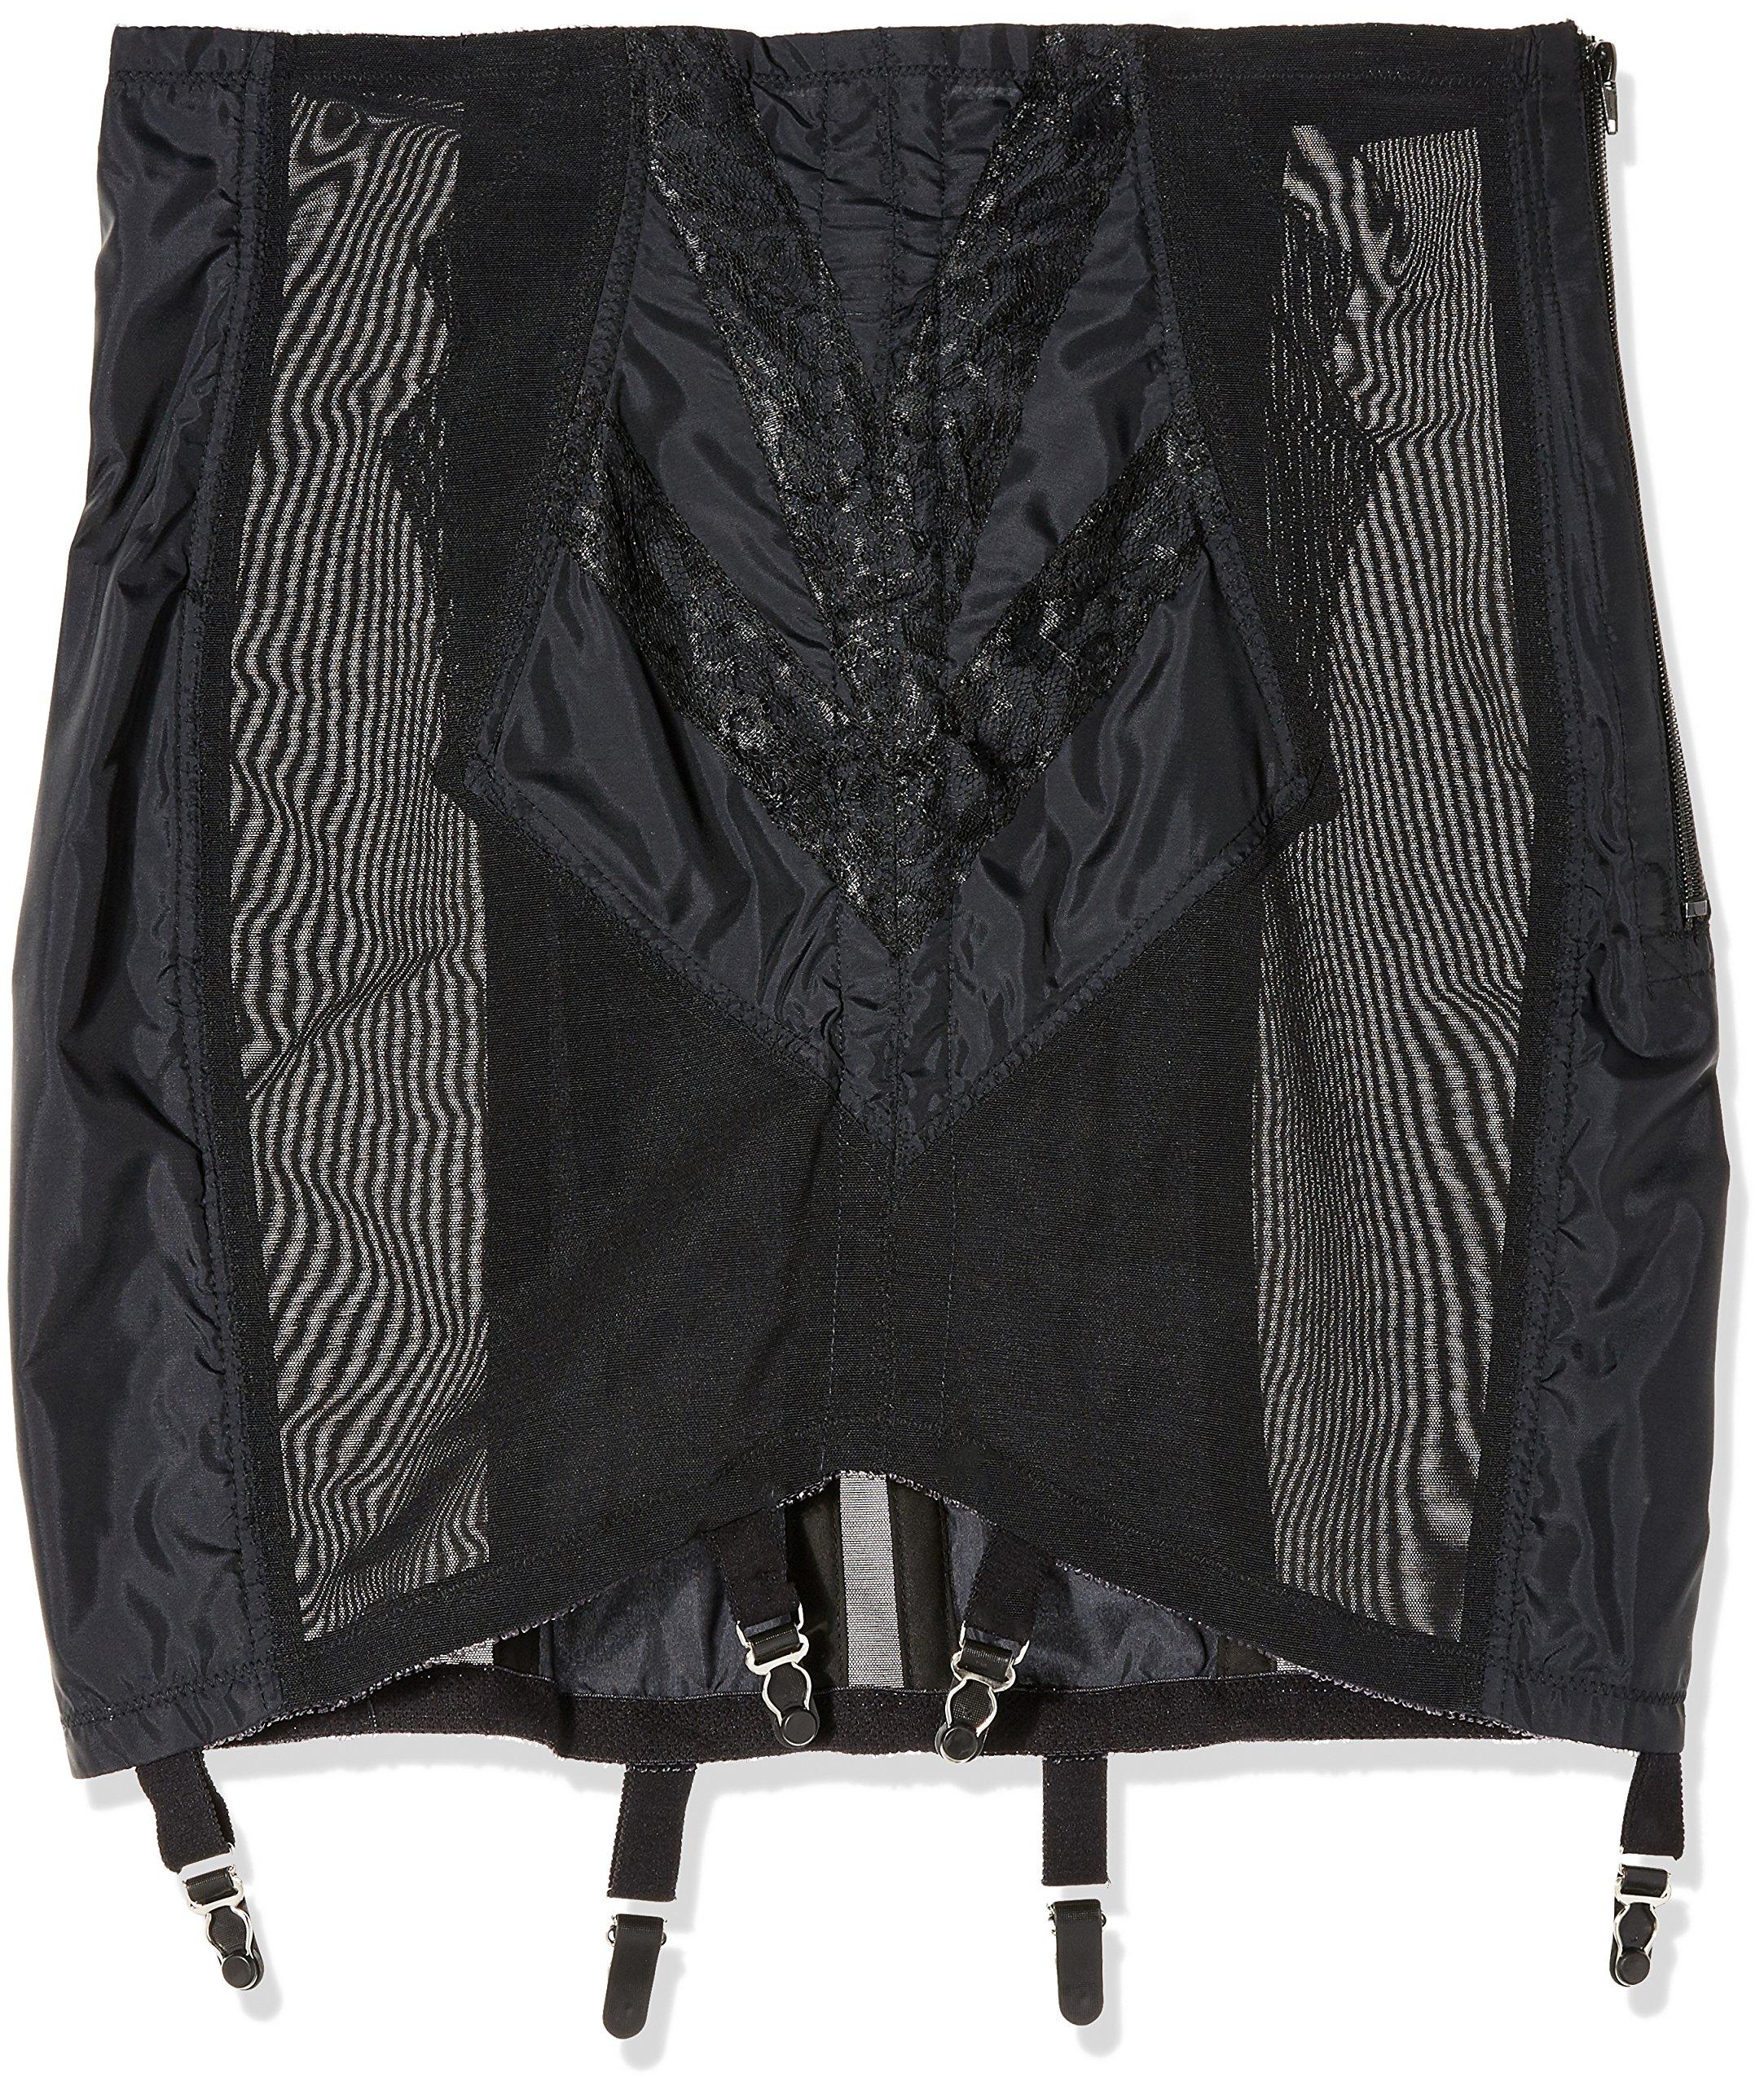 07caac61b Rago Shapewear Women s Plus-Size High Waist Open Bottom Girdle with Zipper   Amazon.ca  Clothing   Accessories